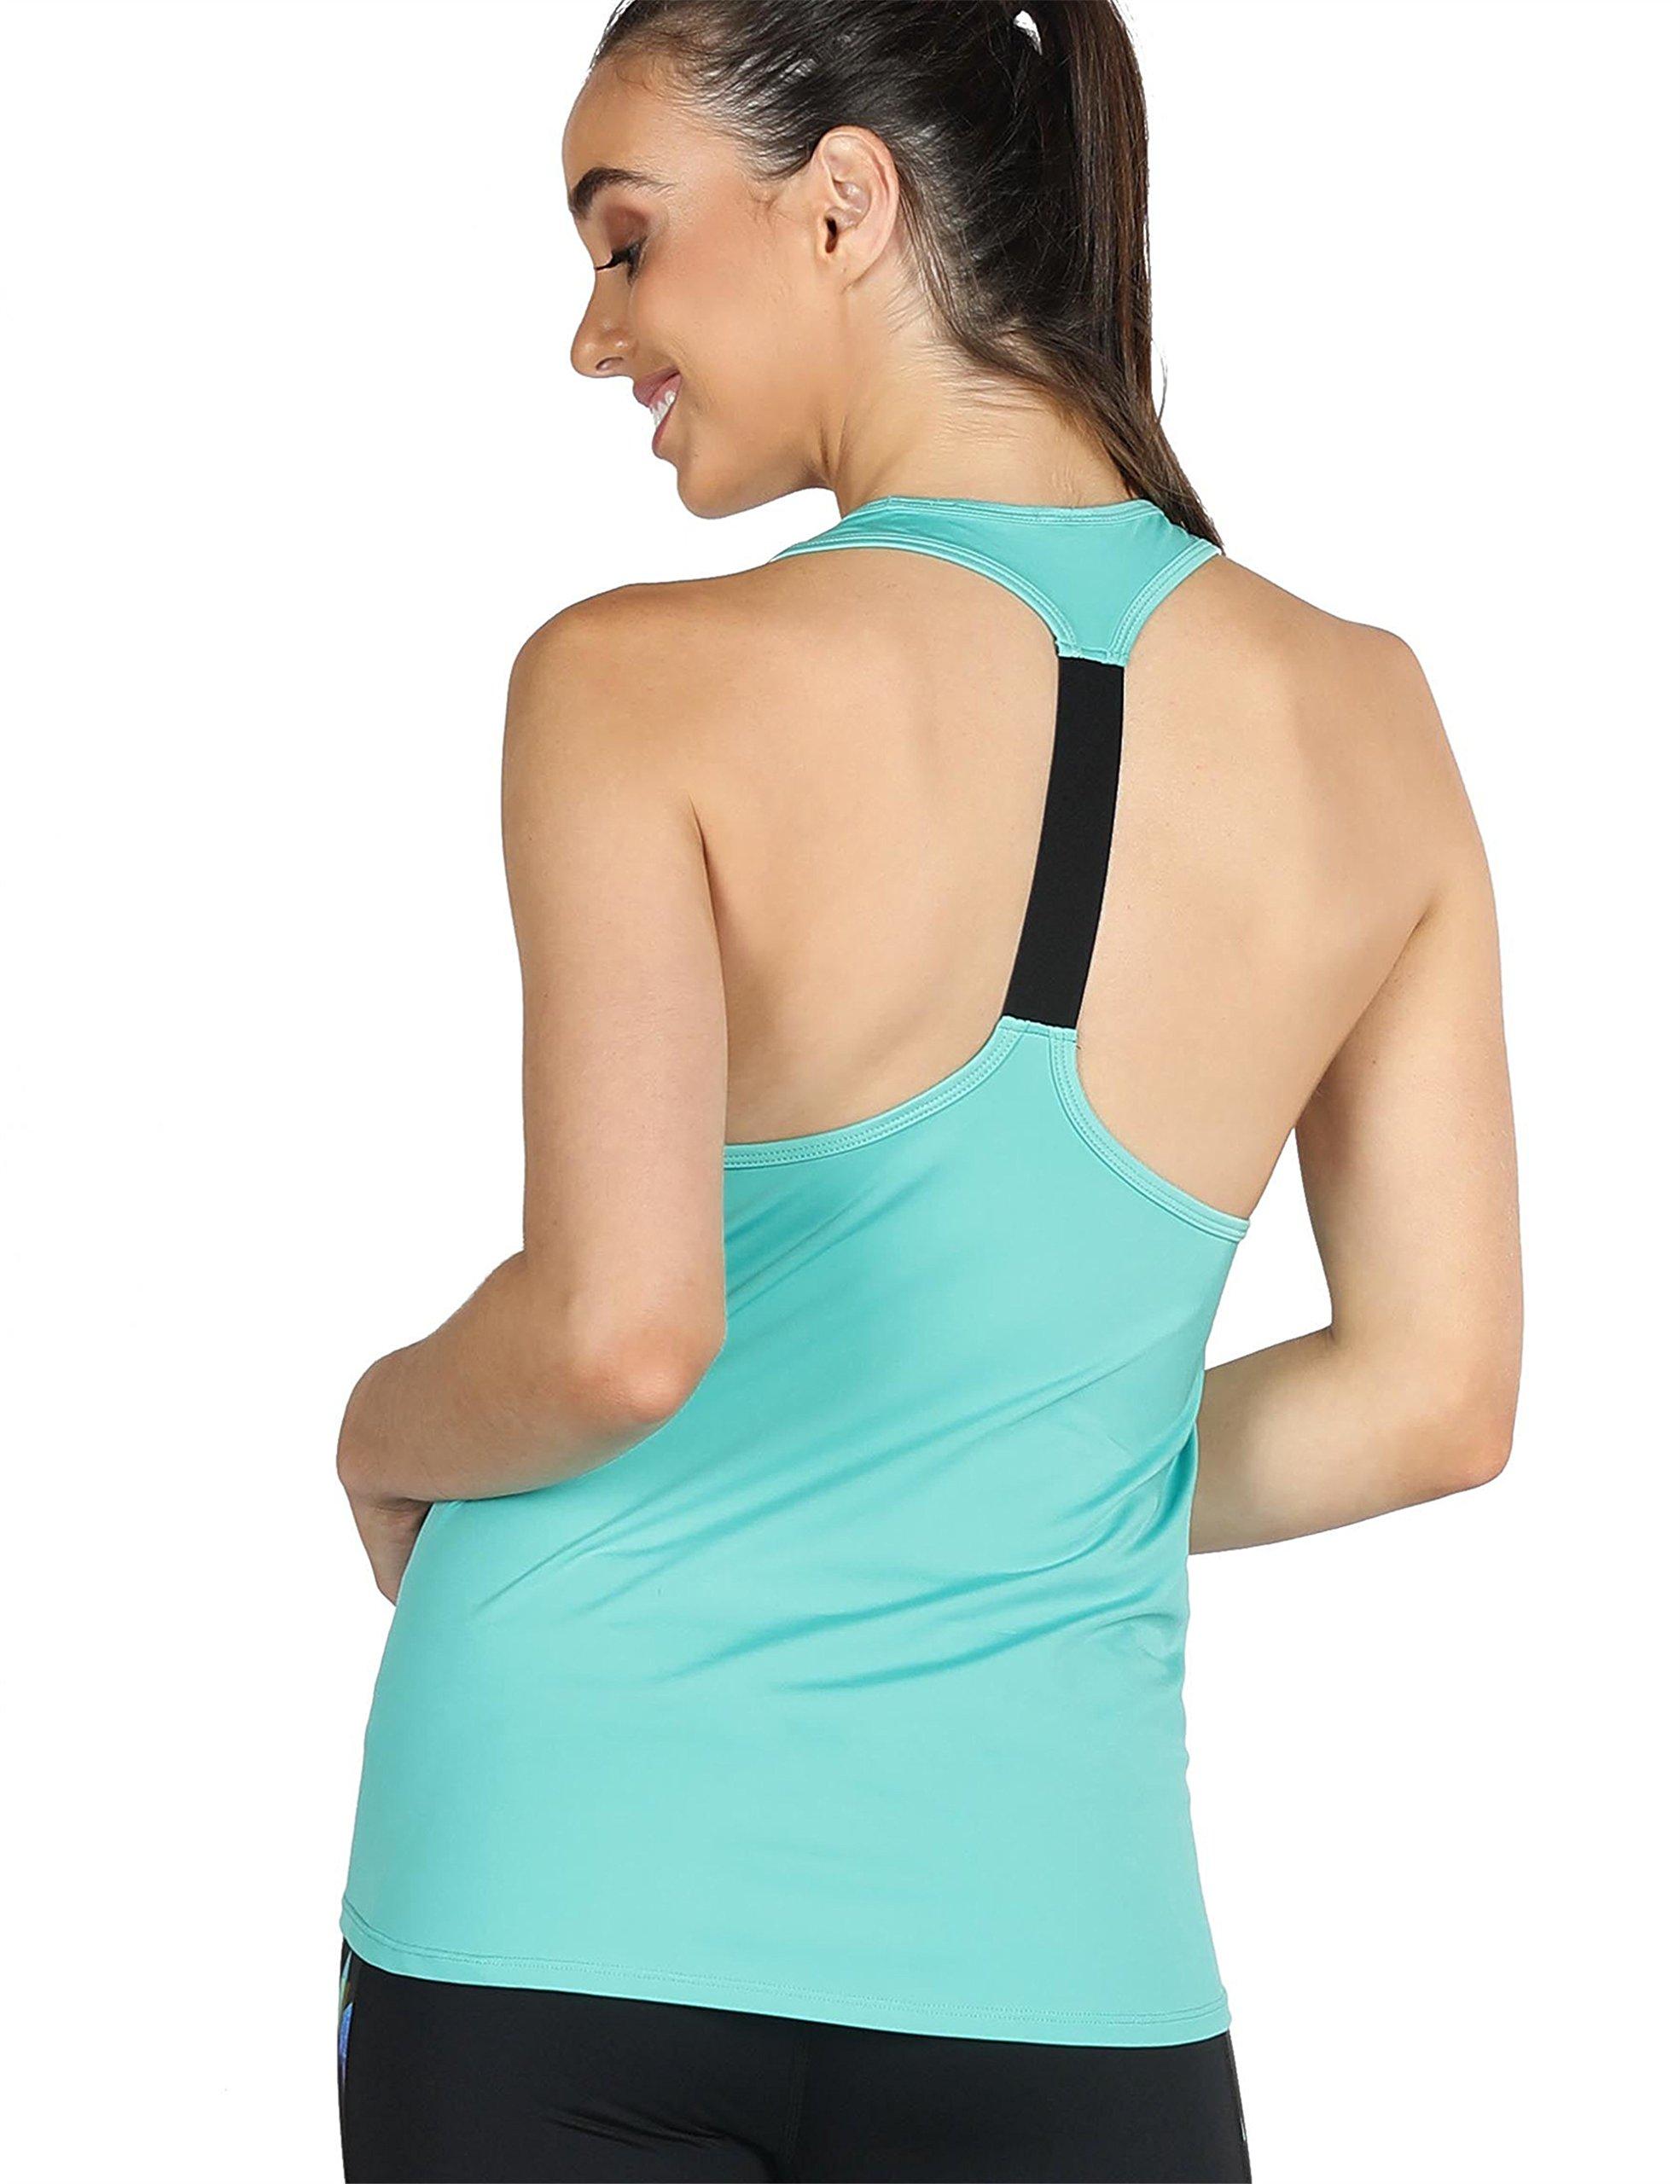 icyzone Activewear Workout Yoga Fitness Sports Racerback Tank Top T-Back Women (S, Florida Keys)